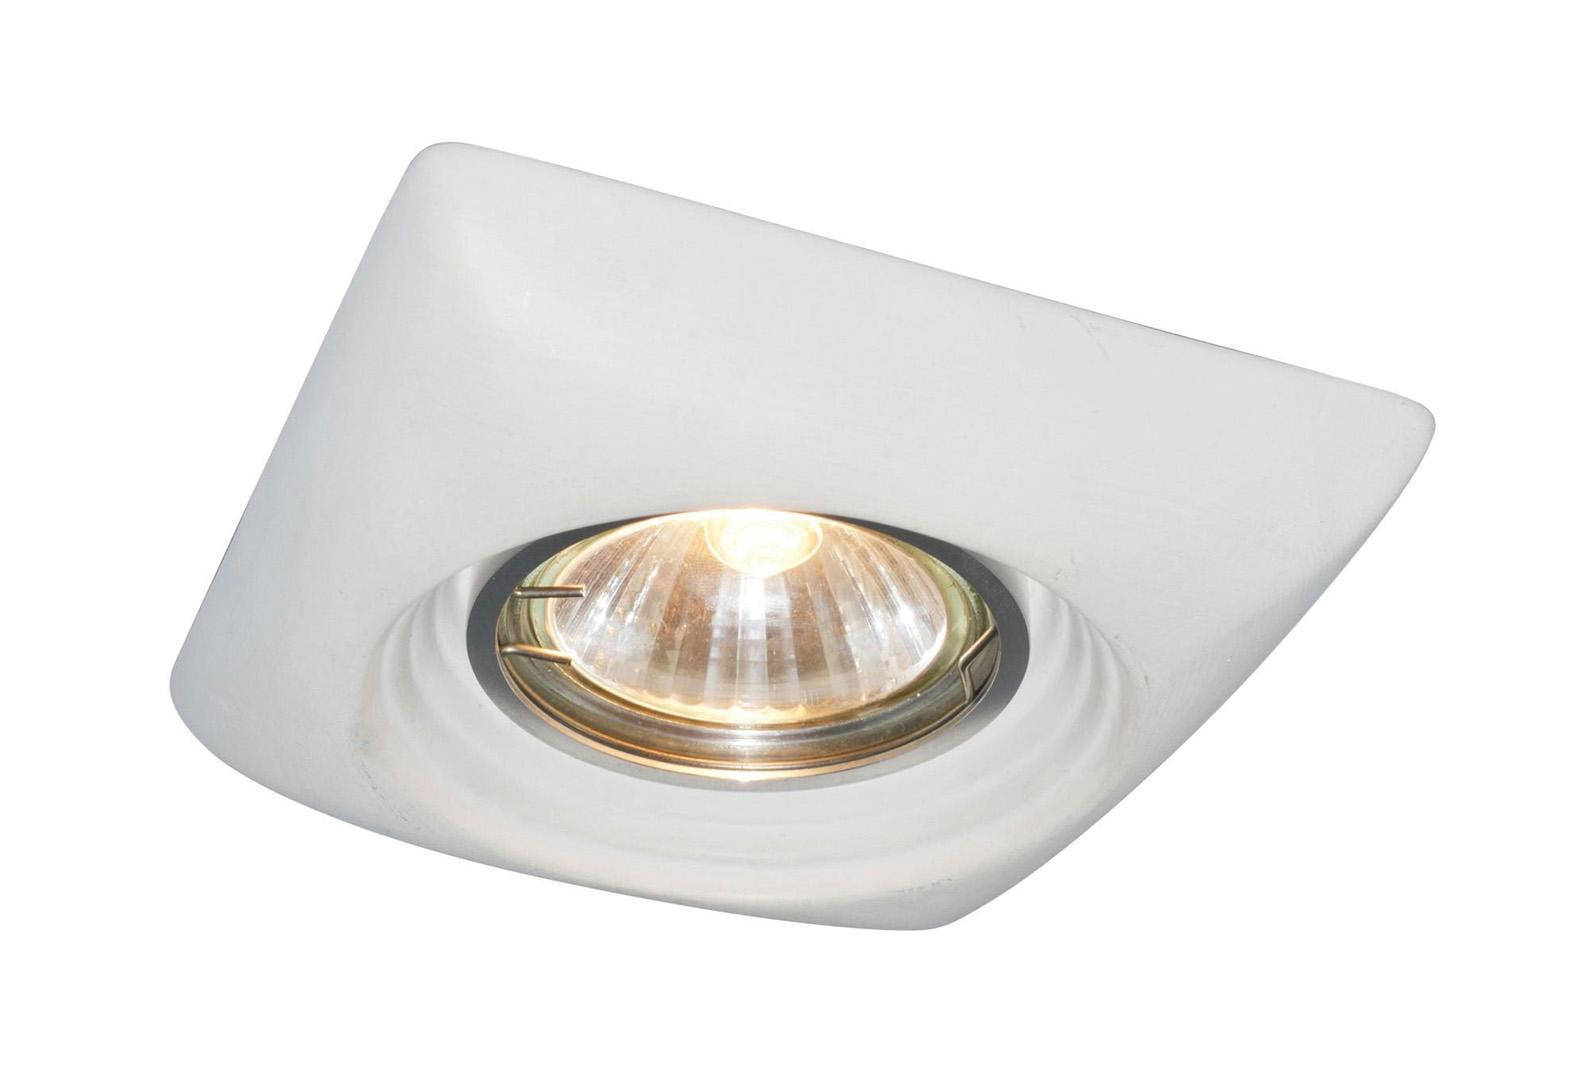 A5246PL-1WH CRATERE Встраиваемый светильникA5246PL-1WH1x50W; патроны GU10 и G5,3 в комплекте Материал: Арматура: КерамикаРазмер: 110x110x42Цвет: Белый